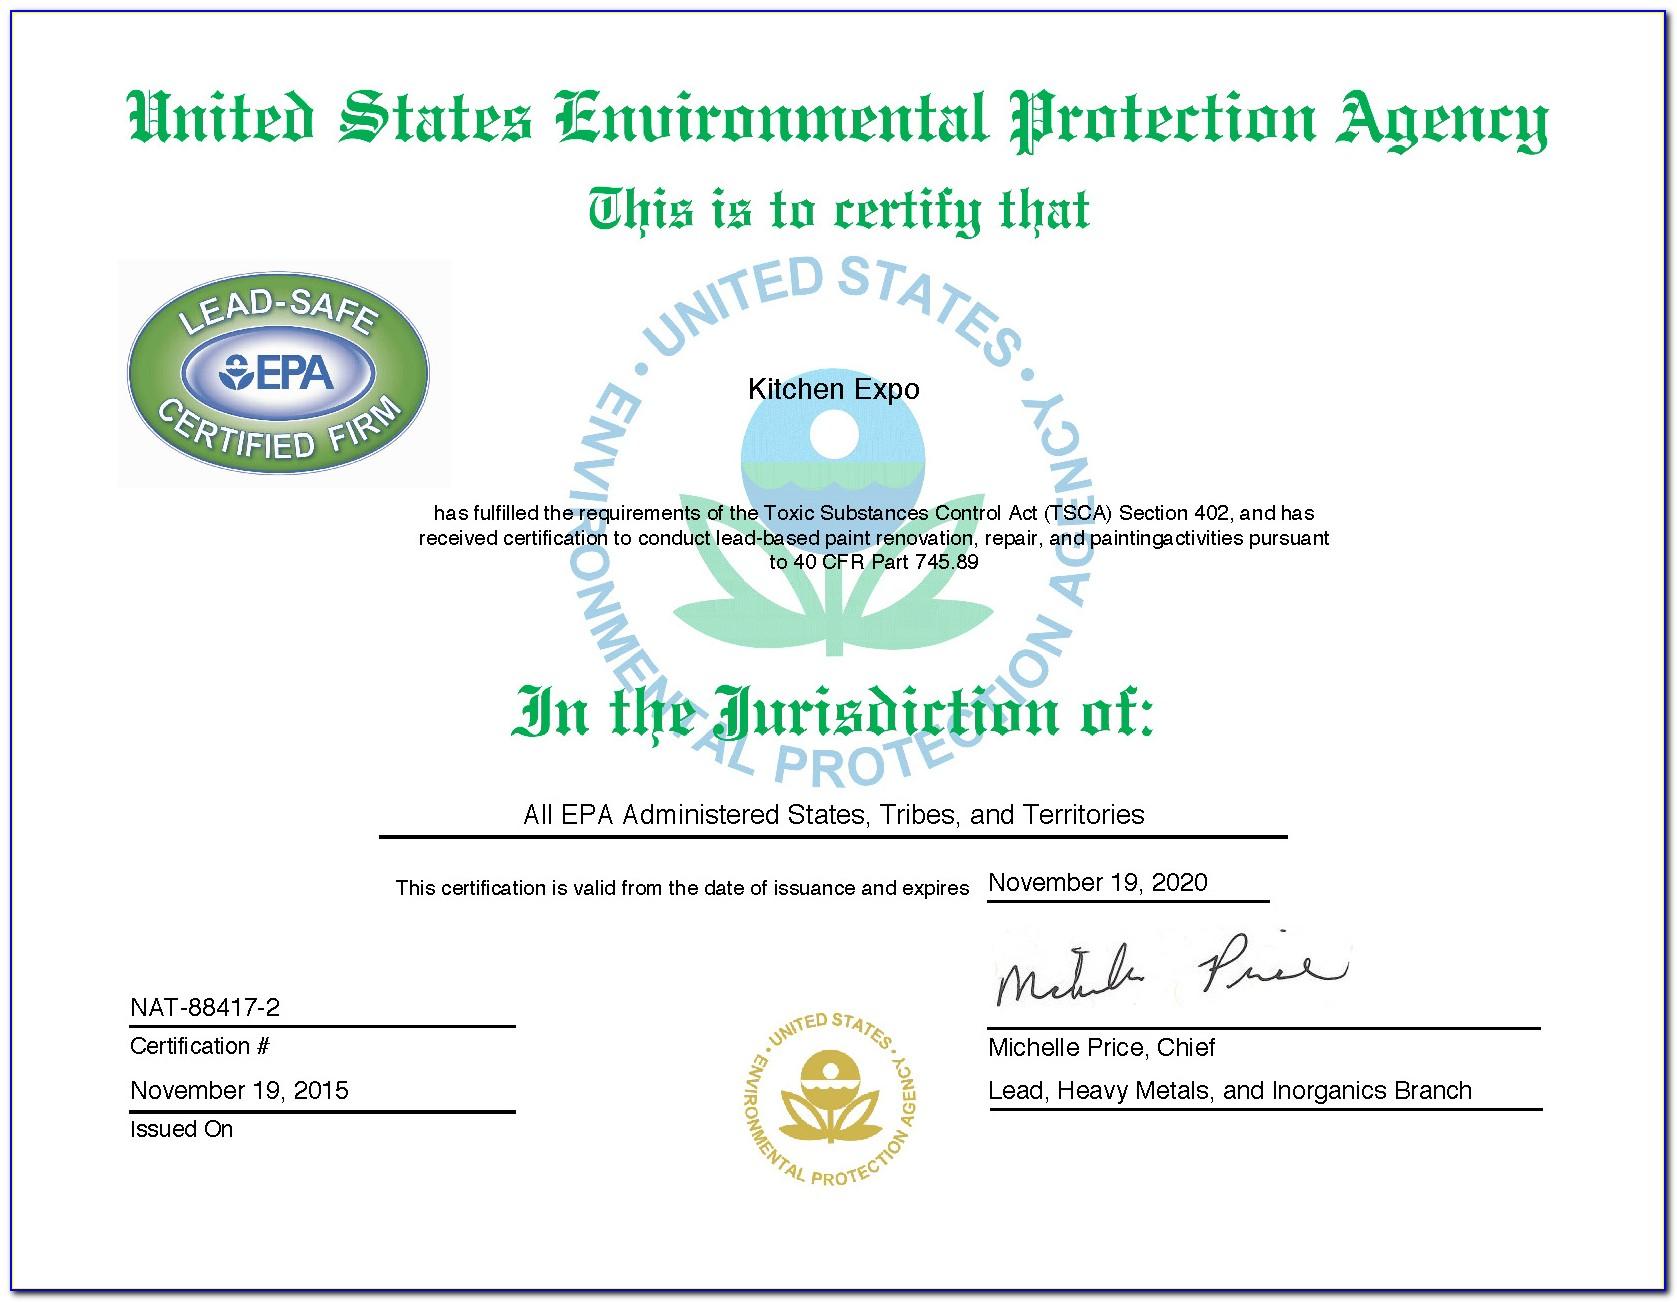 Universal Cfc Certification Preferred